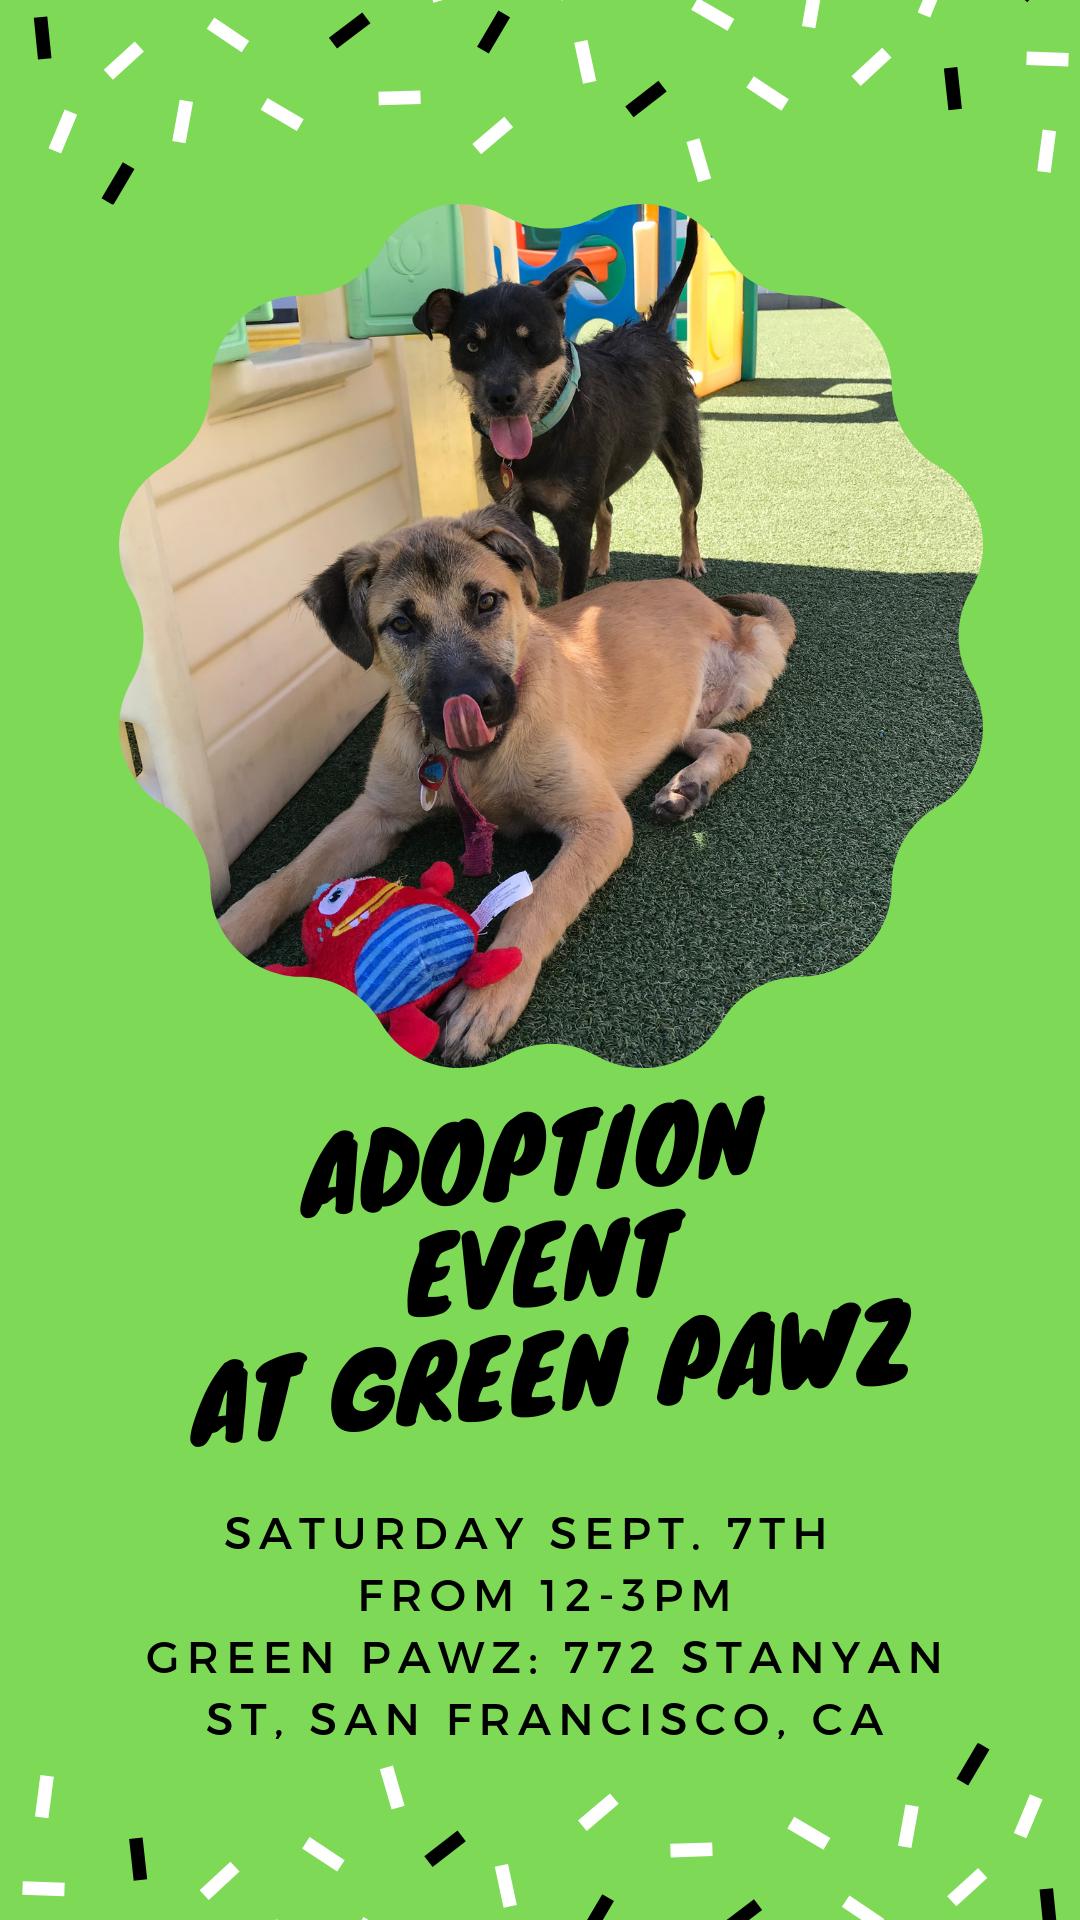 Adoption Event at Green Pawz! @ Green Pawz